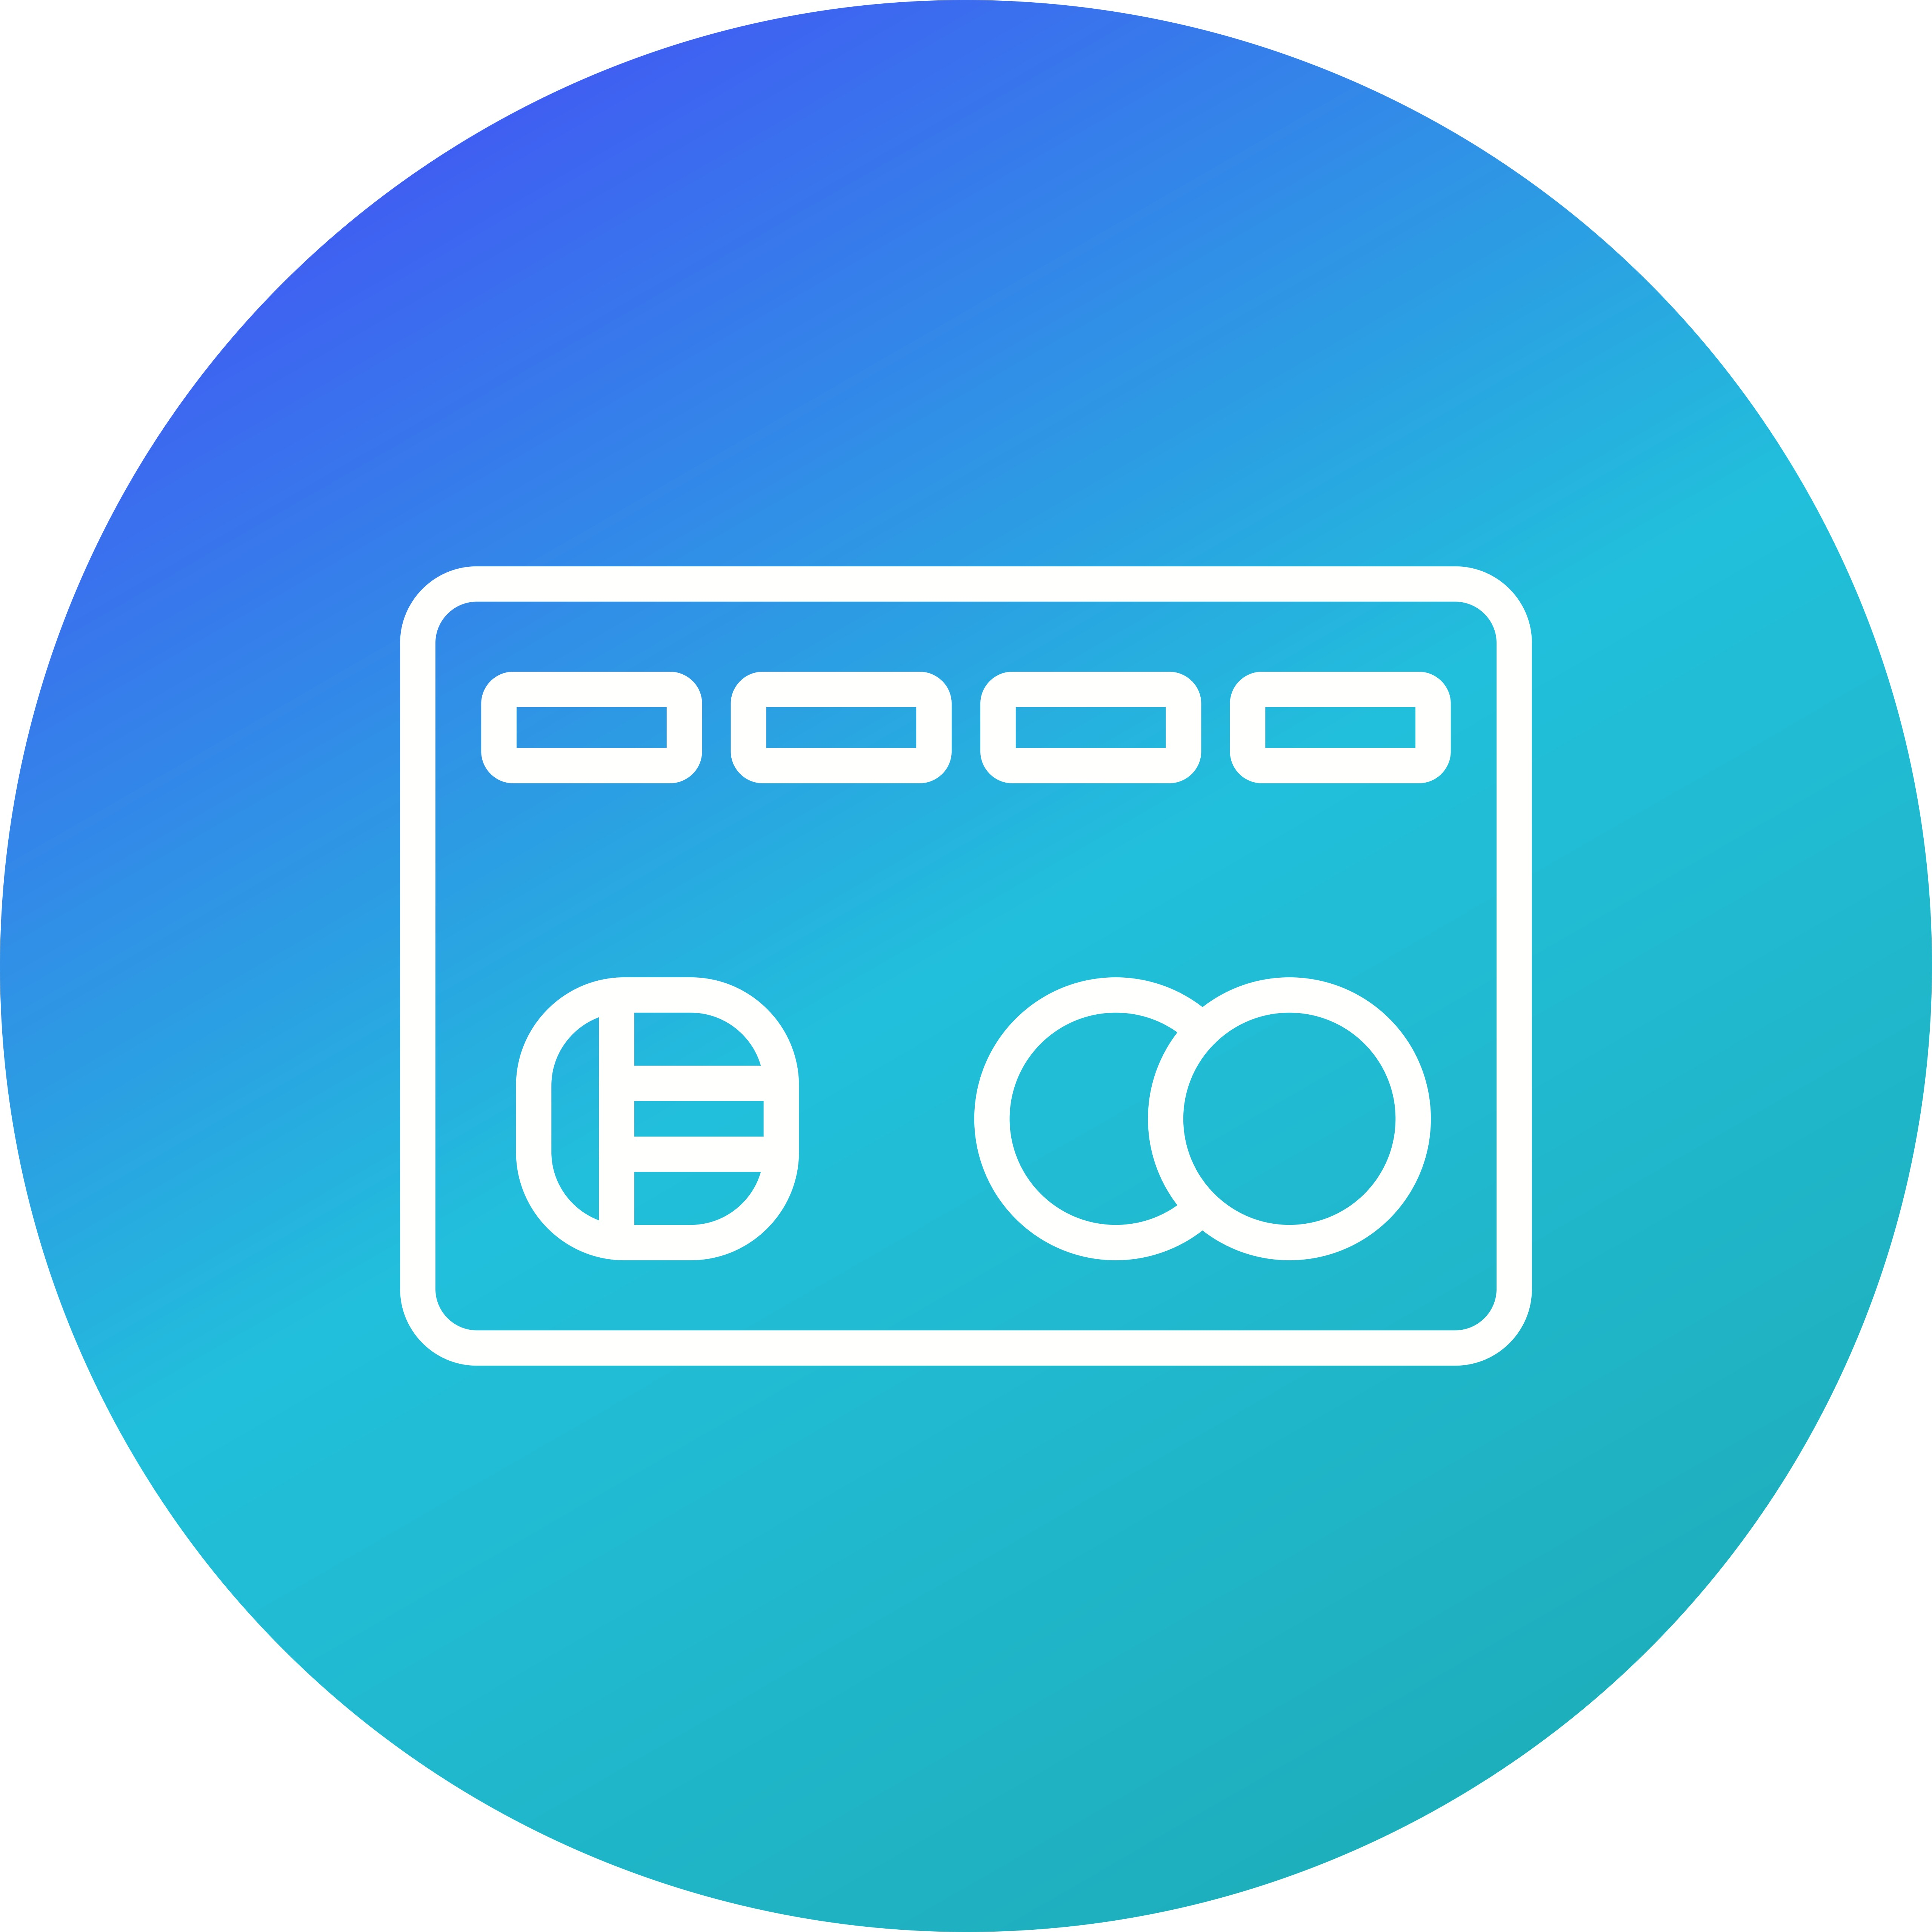 Credit card Vector Icon - Download Free Vectors, Clipart Graphics & Vector Art